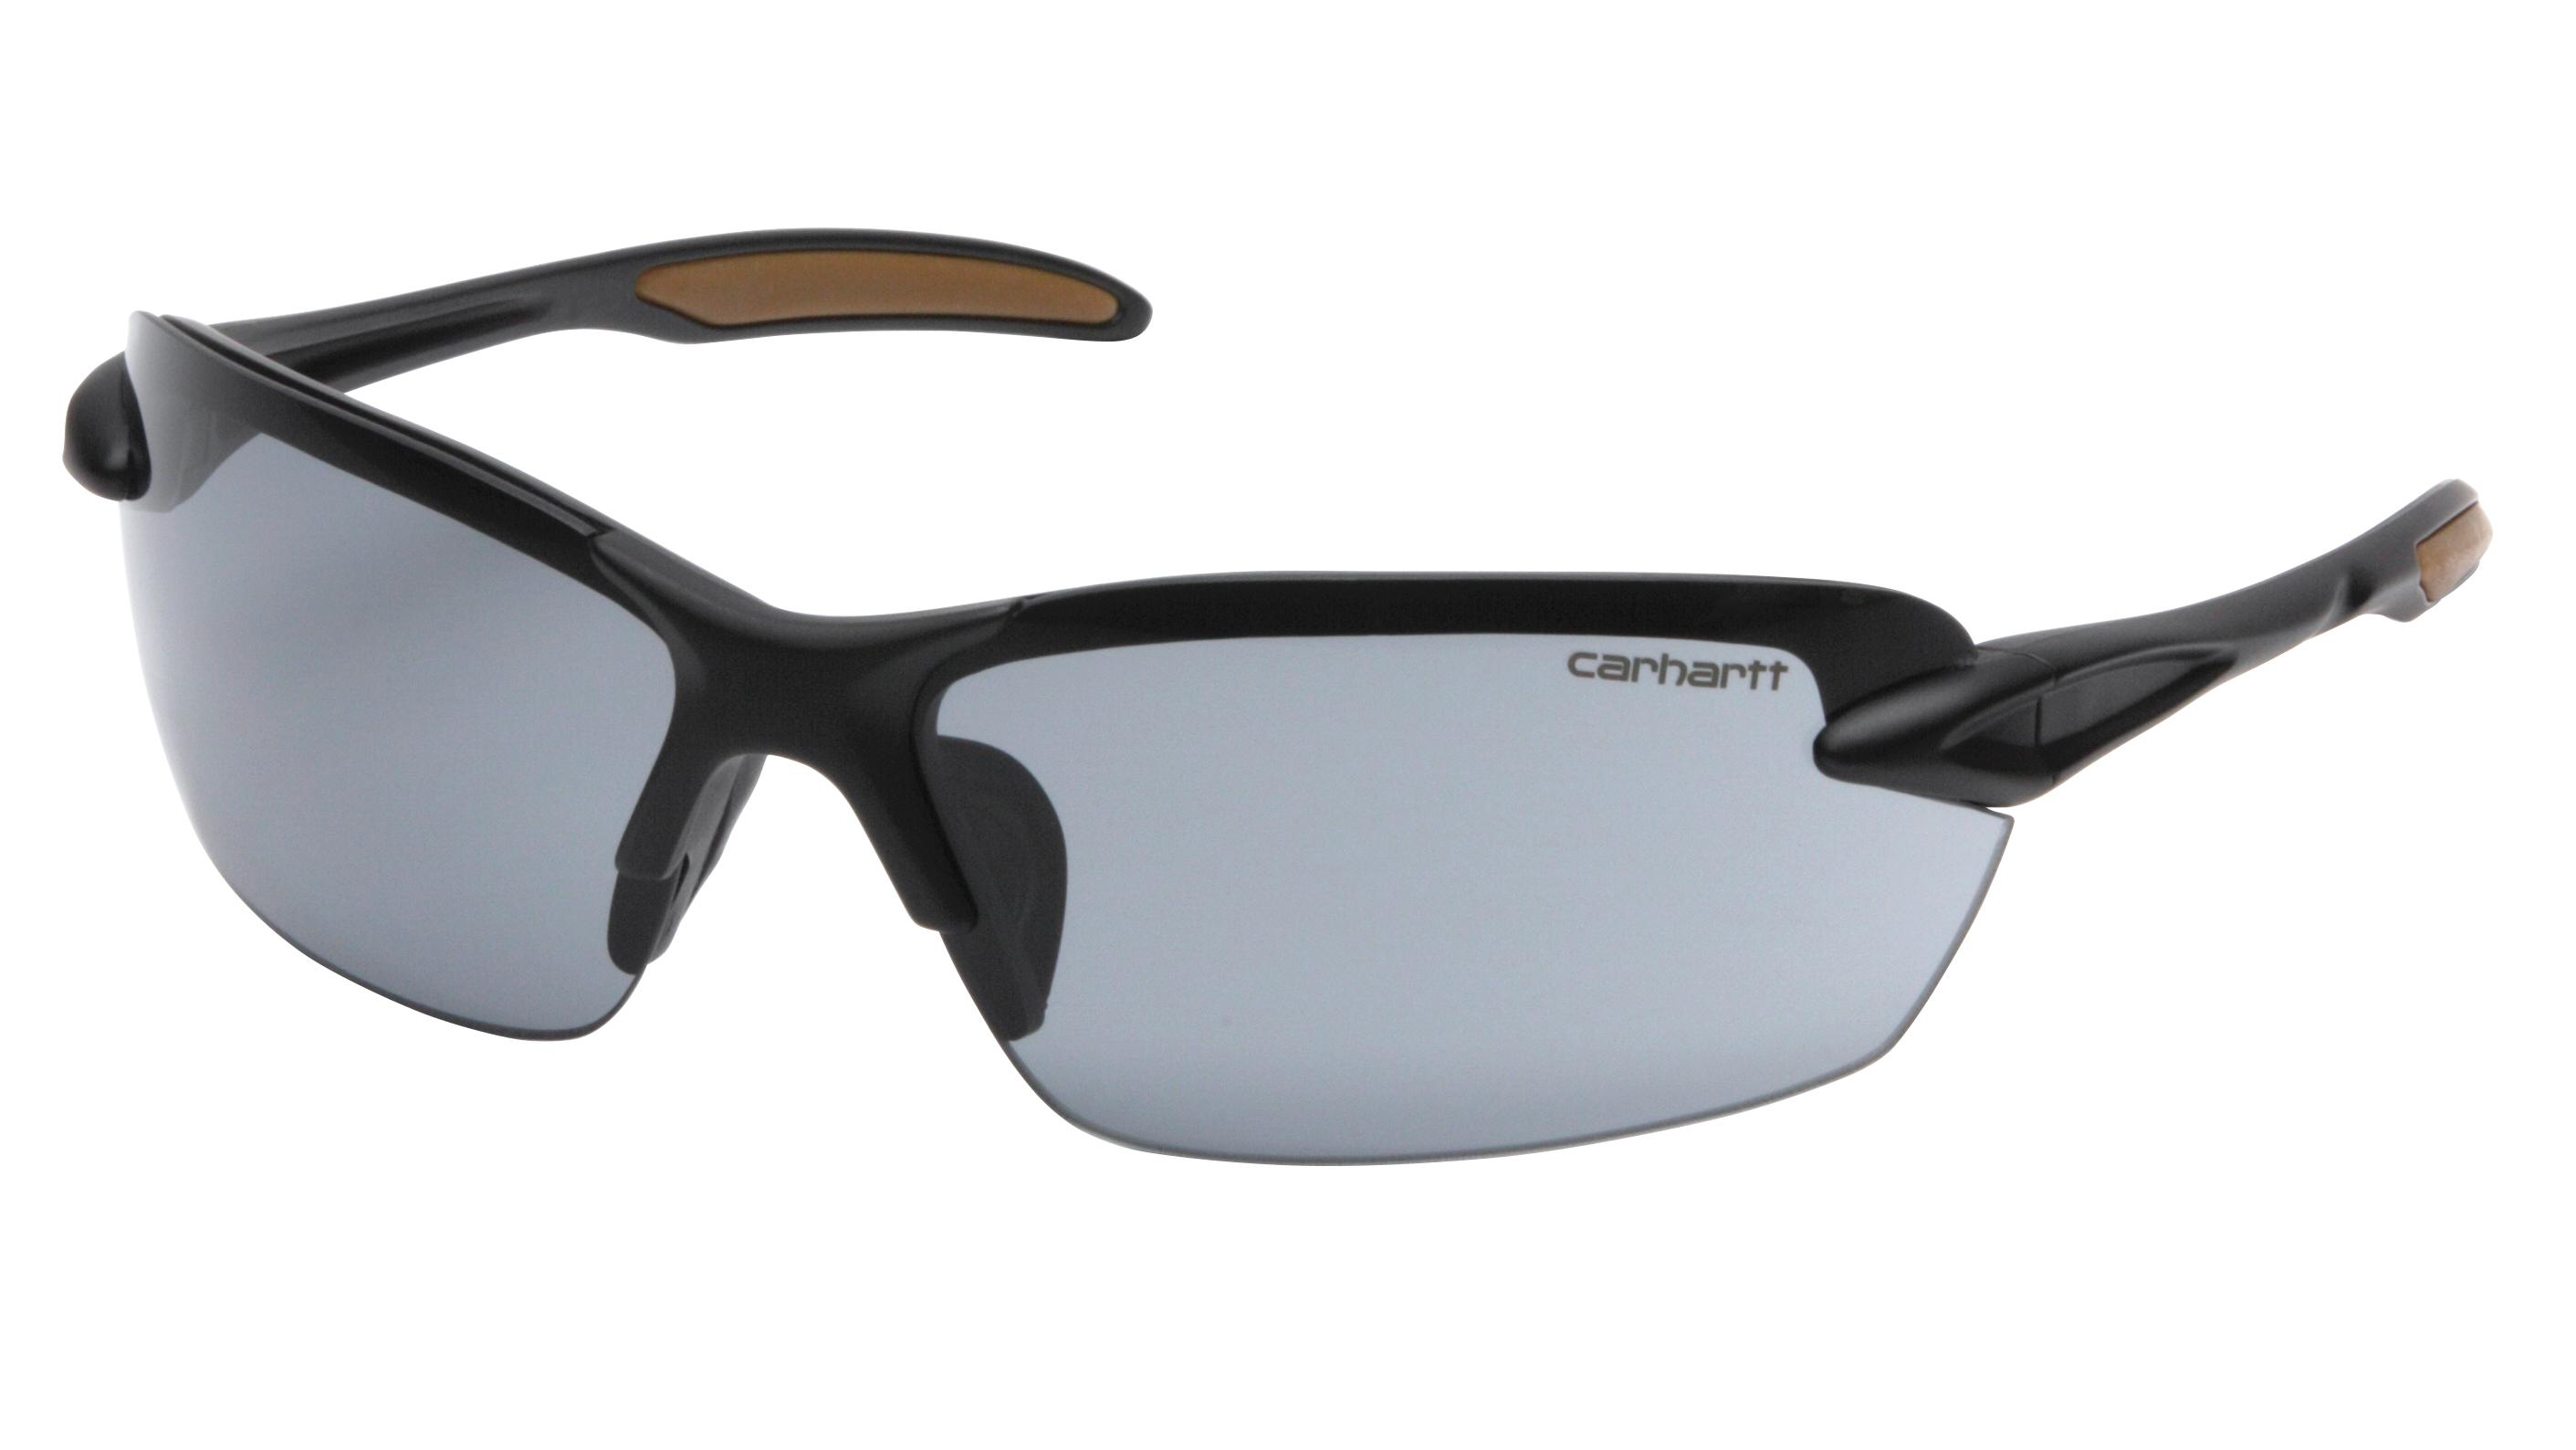 Carhartt Herren Schutzbrille Spokane, Grau